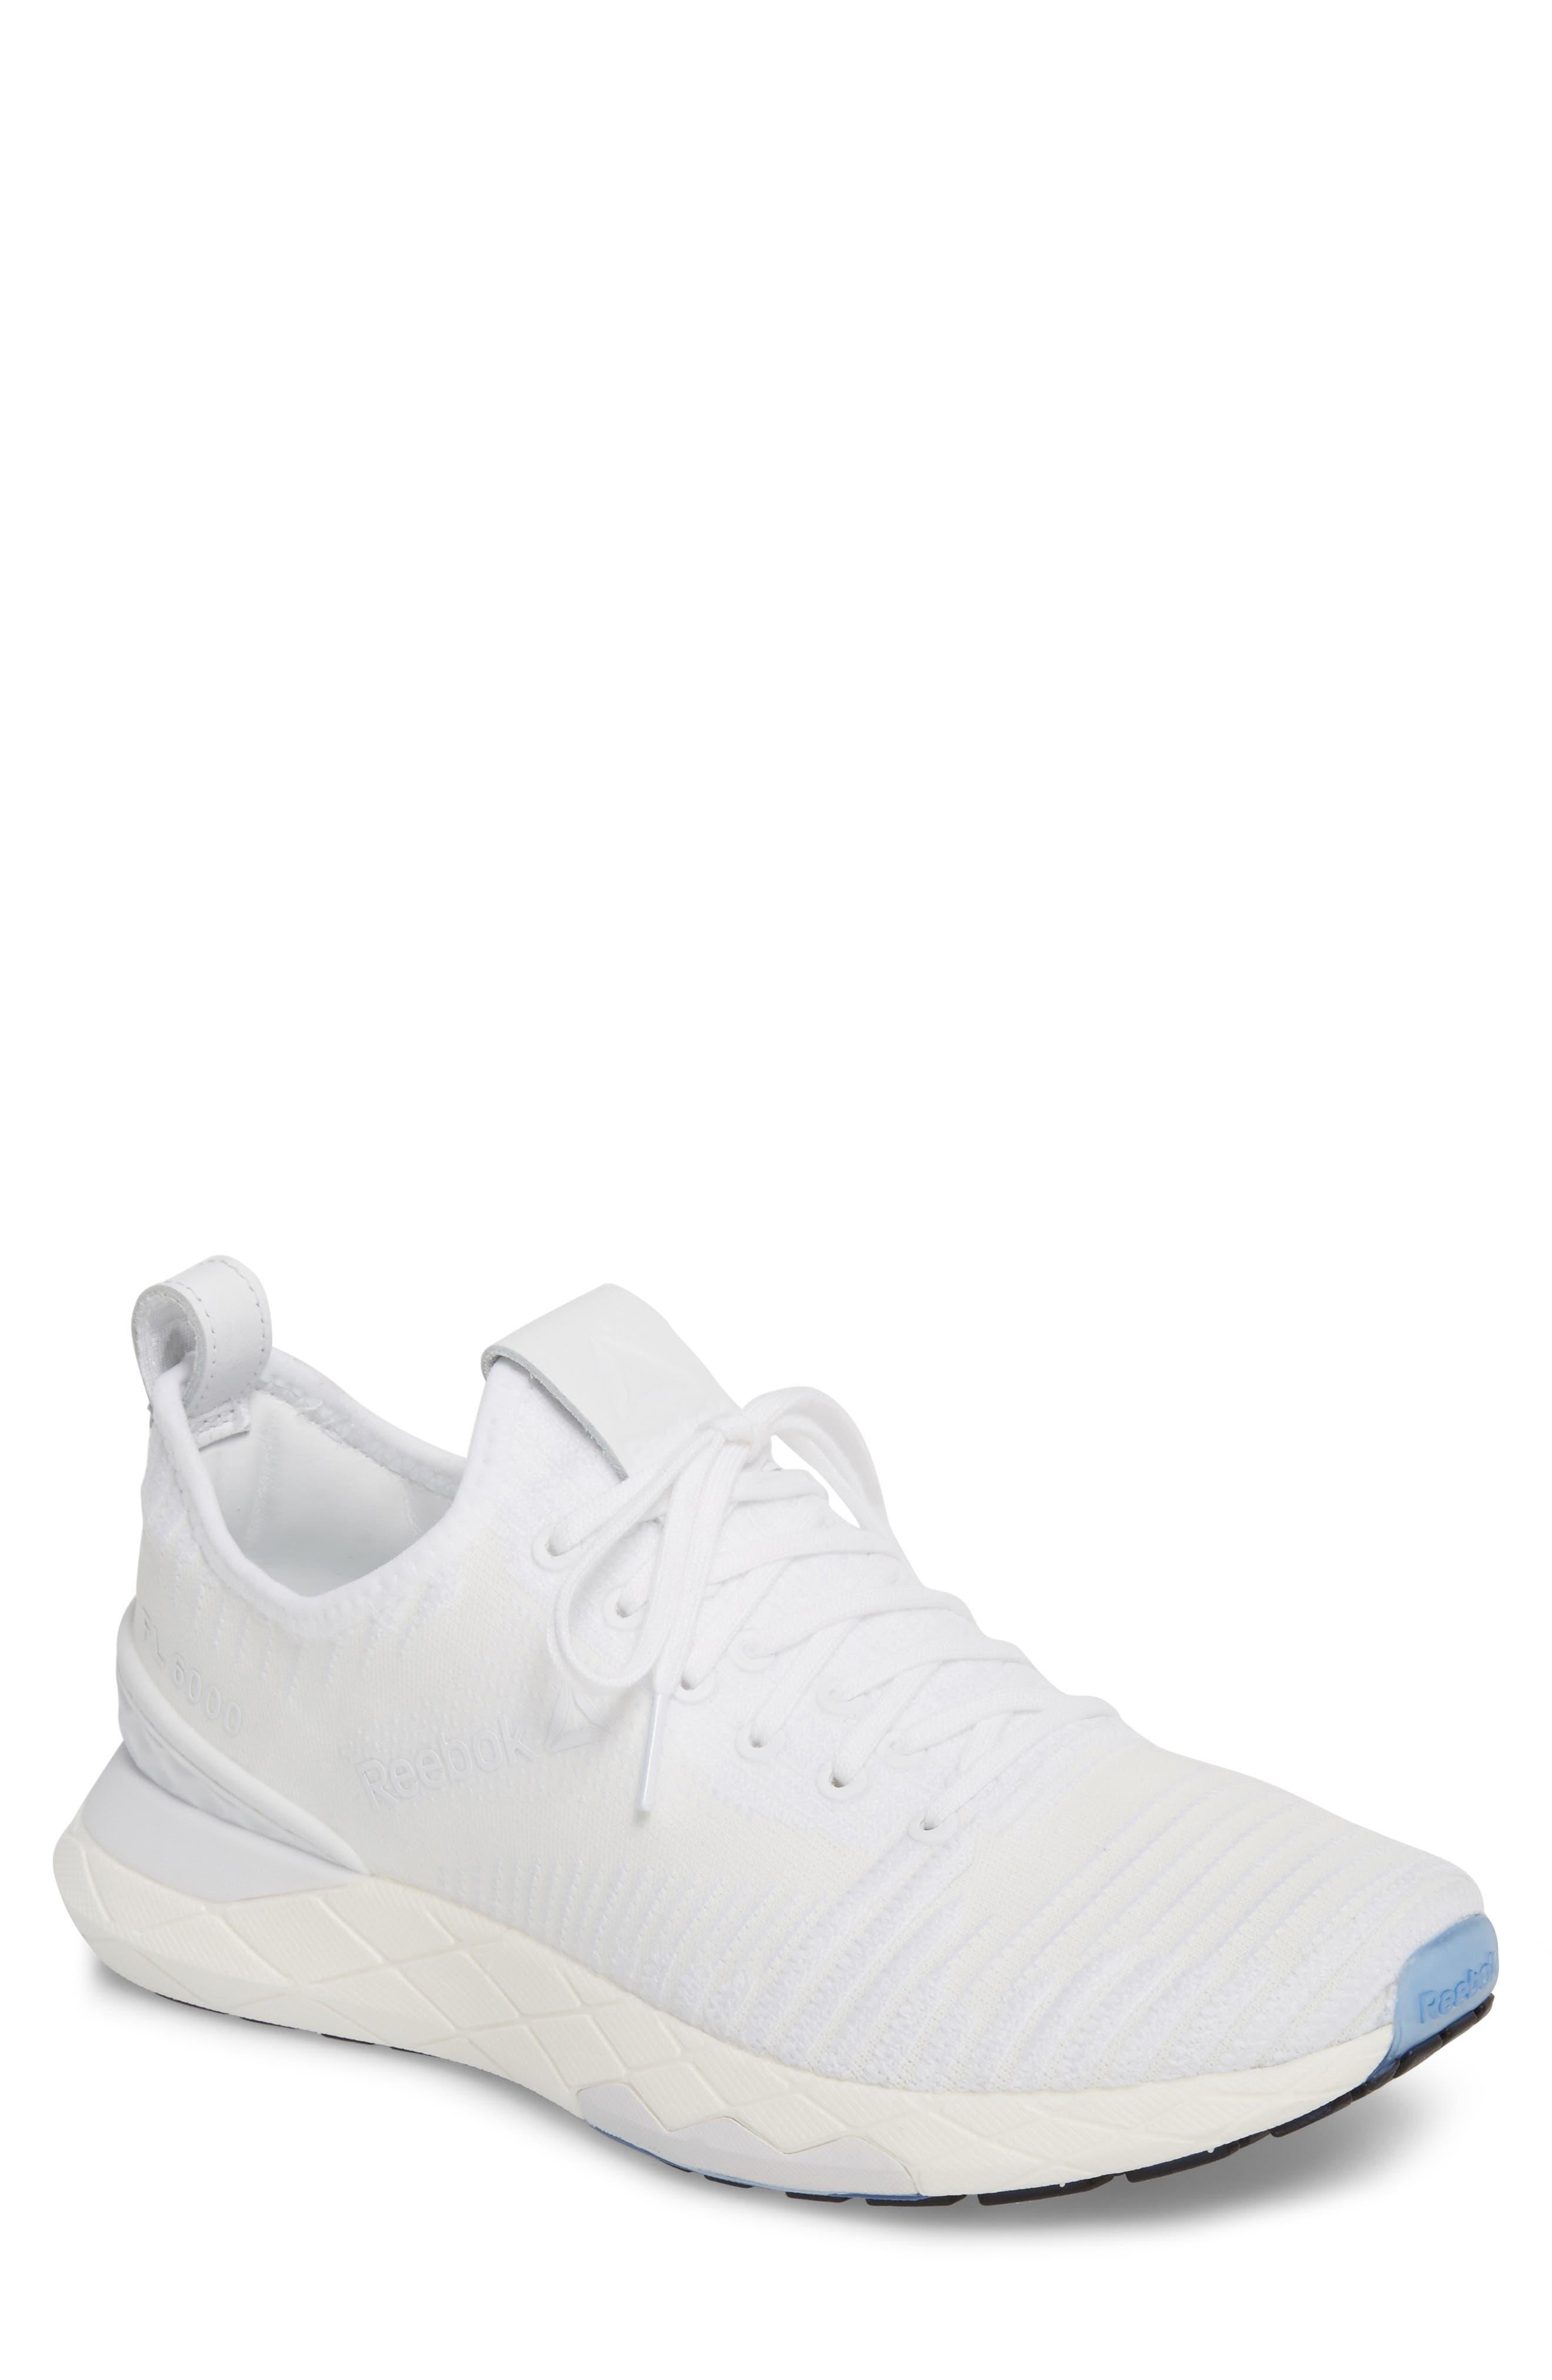 Floatride Run 6000 Running Shoe,                         Main,                         color, White